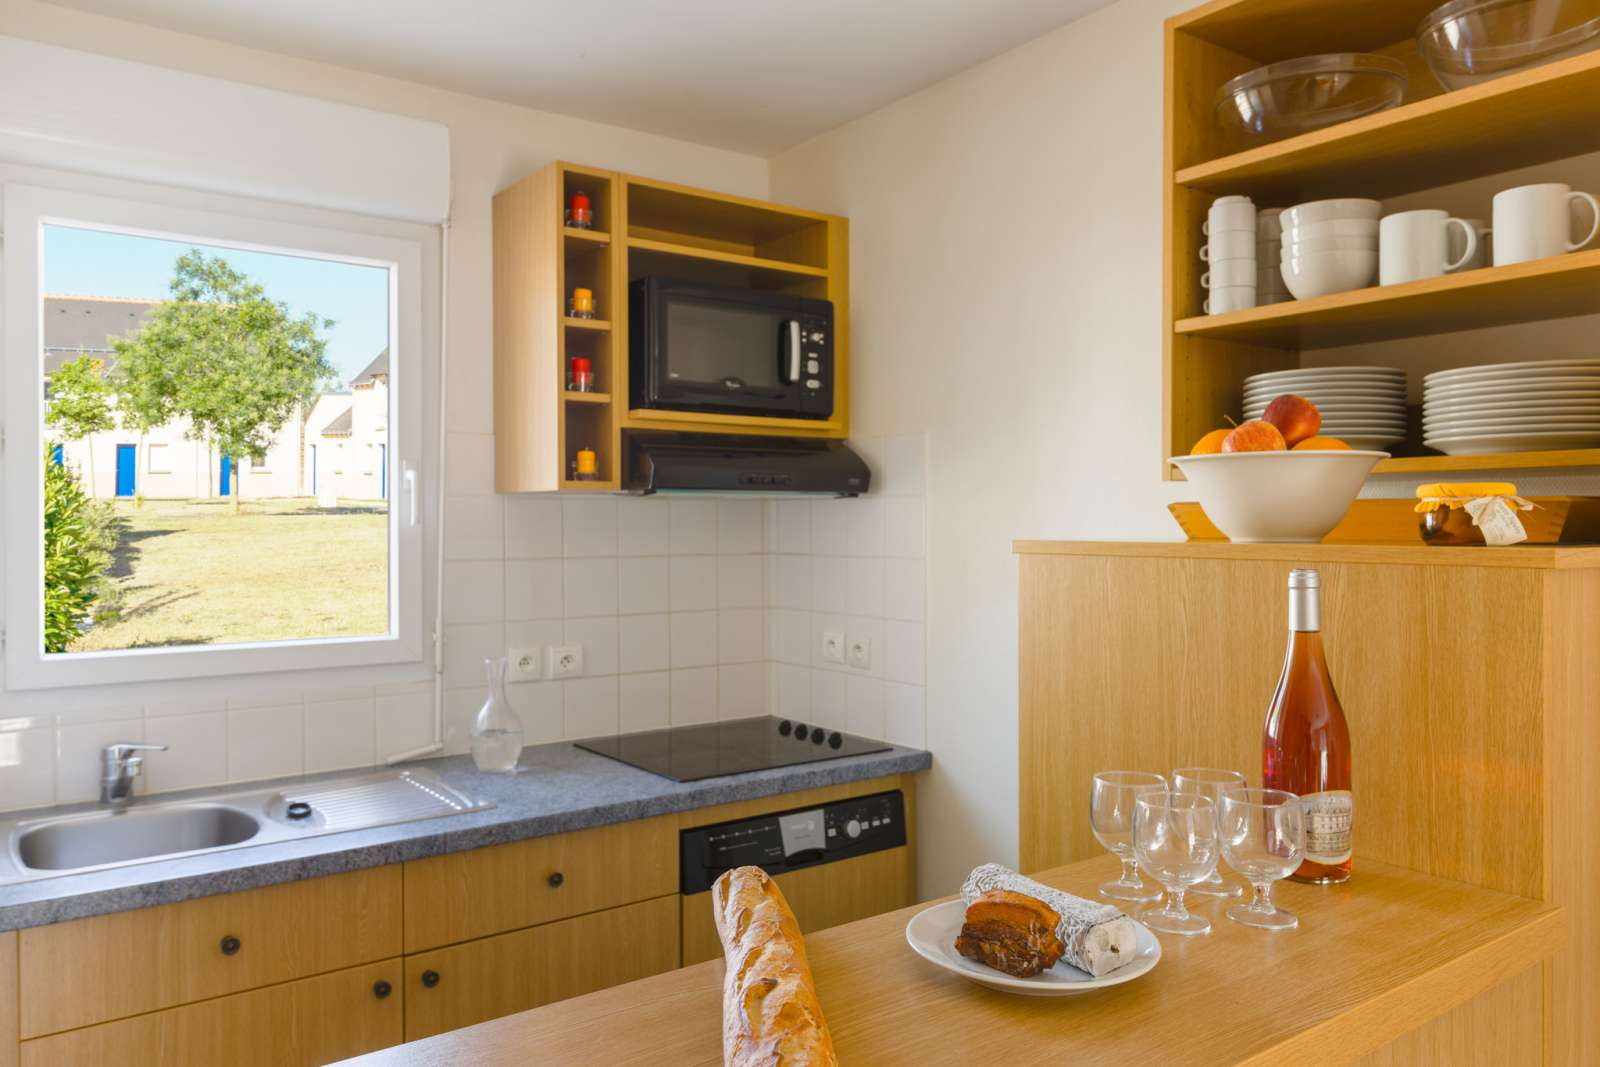 residenz les jardins renaissance ferien vermietungen. Black Bedroom Furniture Sets. Home Design Ideas